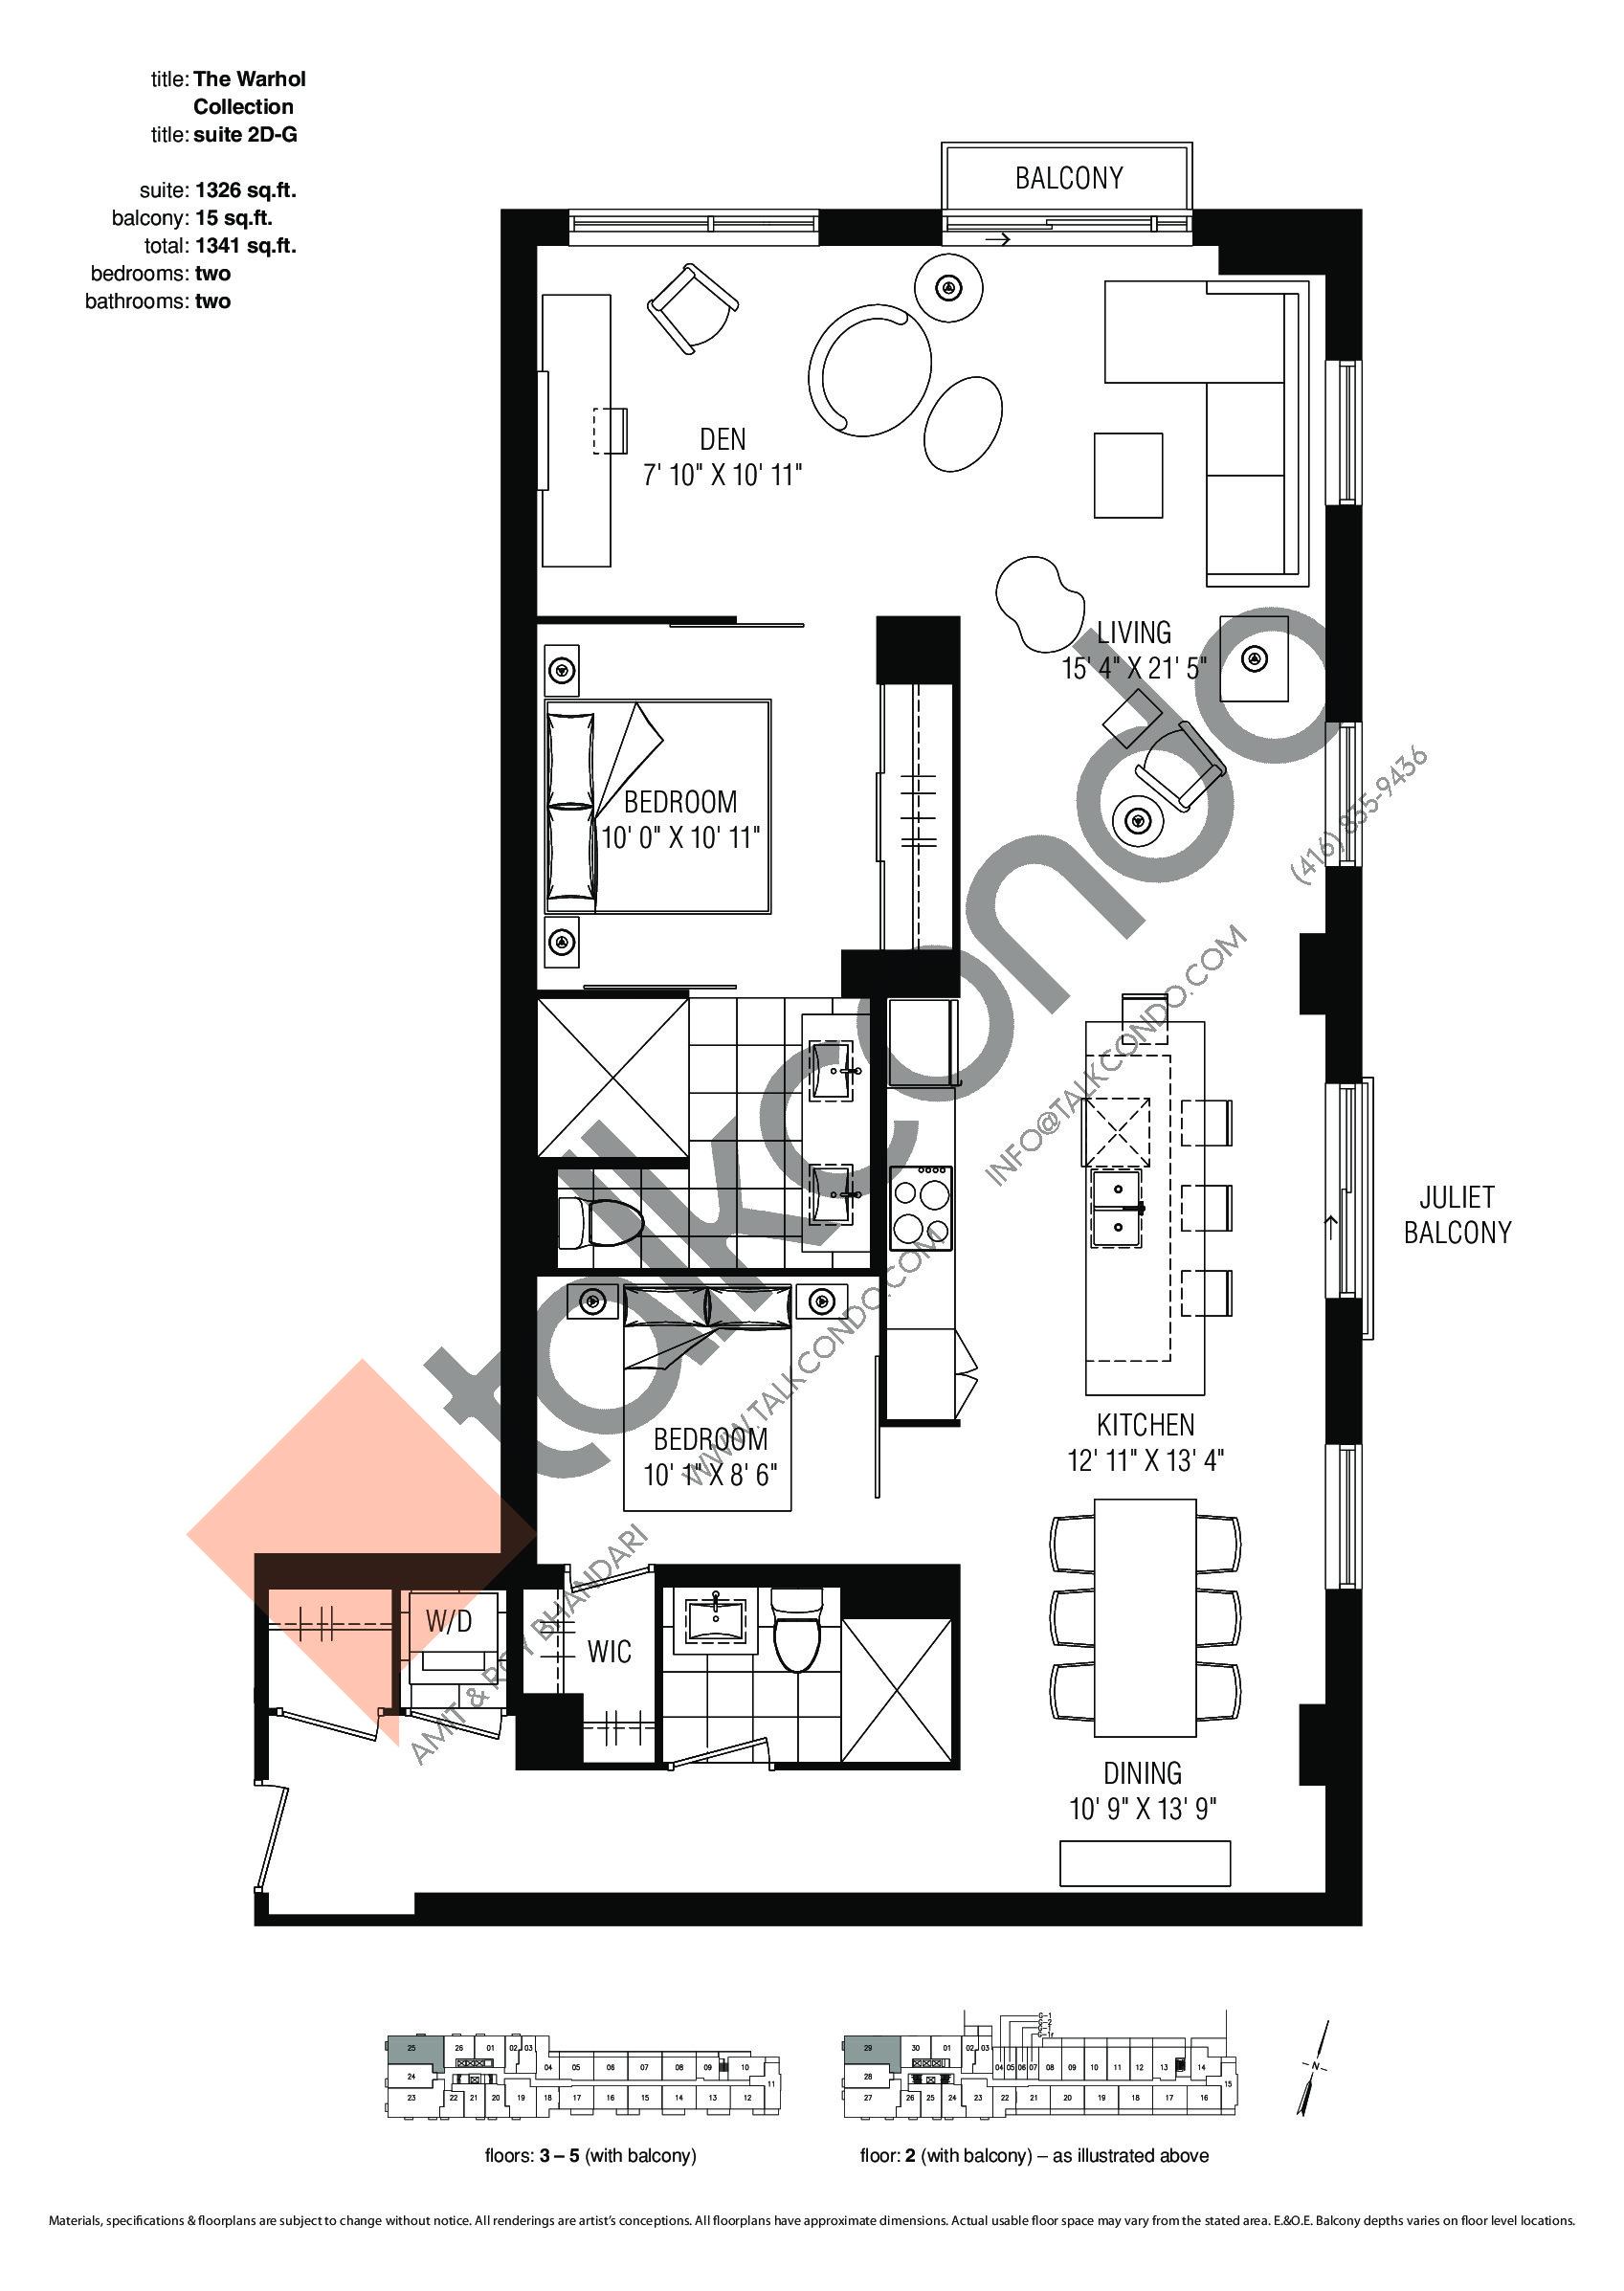 Suite 2D-G Floor Plan at Studio 2 Condos - 1326 sq.ft